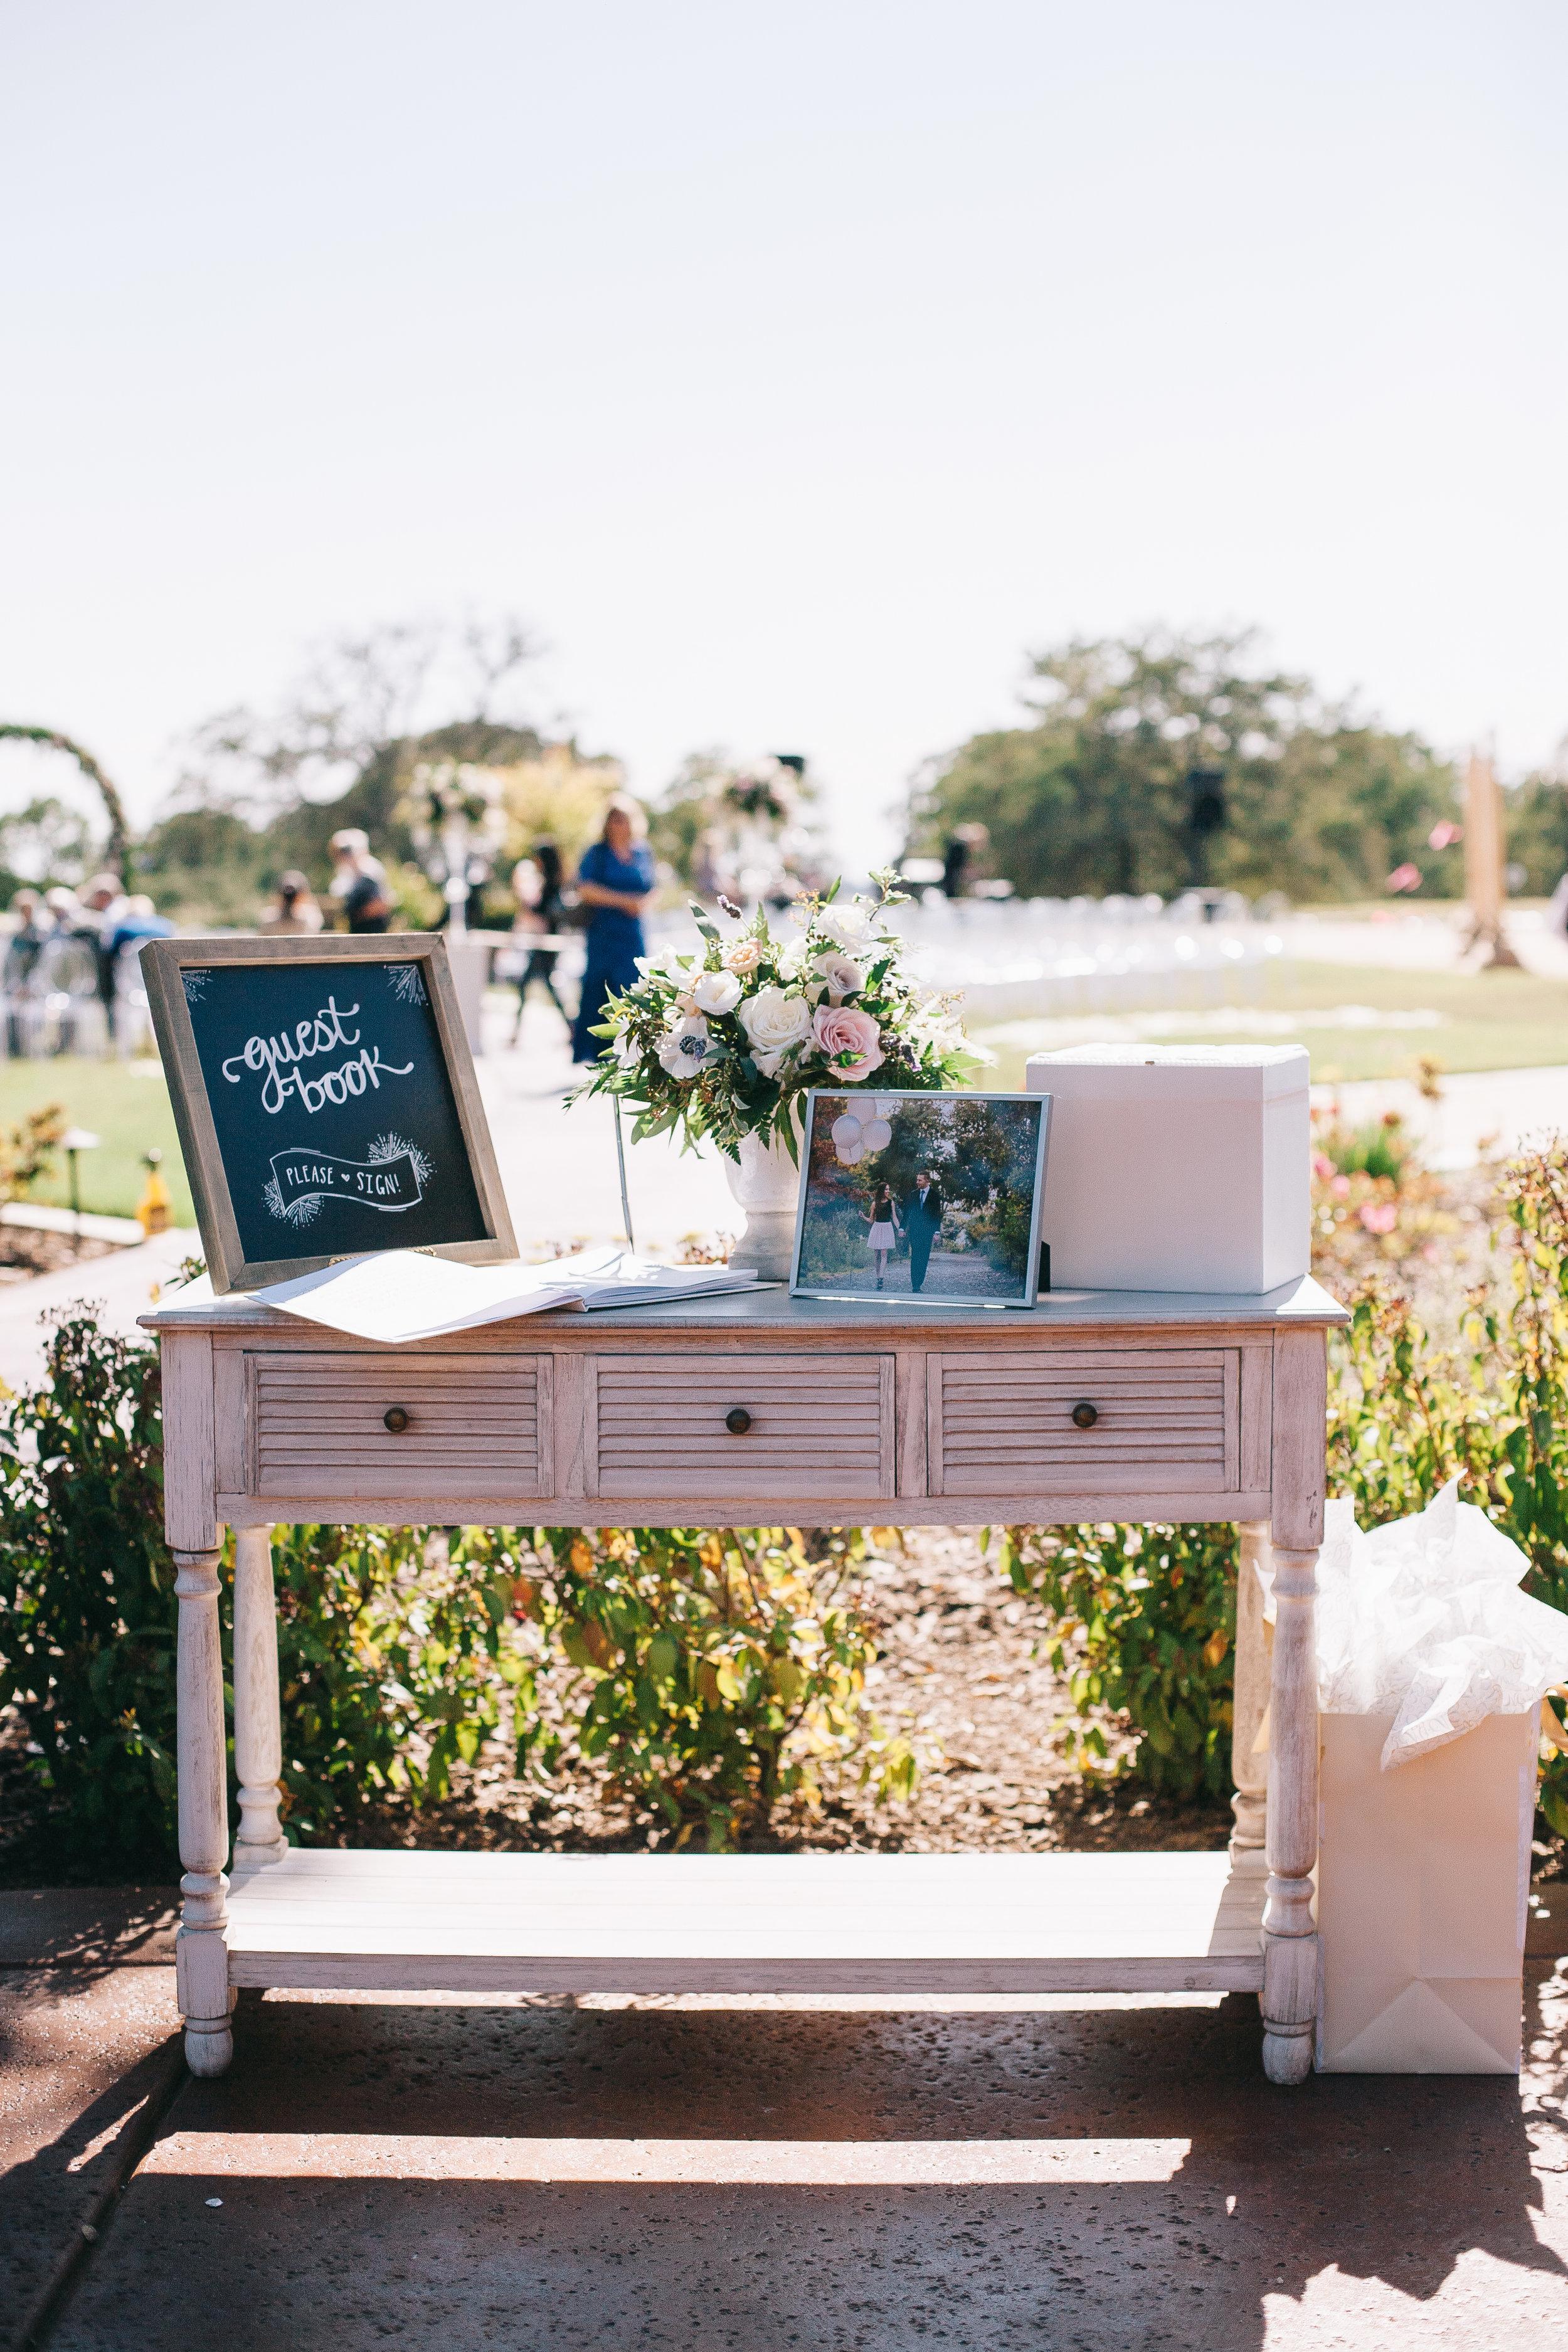 Violette-fleurs-event-design-roseville-anna-perevertaylo-rancho-robles-vinyards-Detail-Bride-groom-Detail-Flowers-sign-in-arrangement.jpg